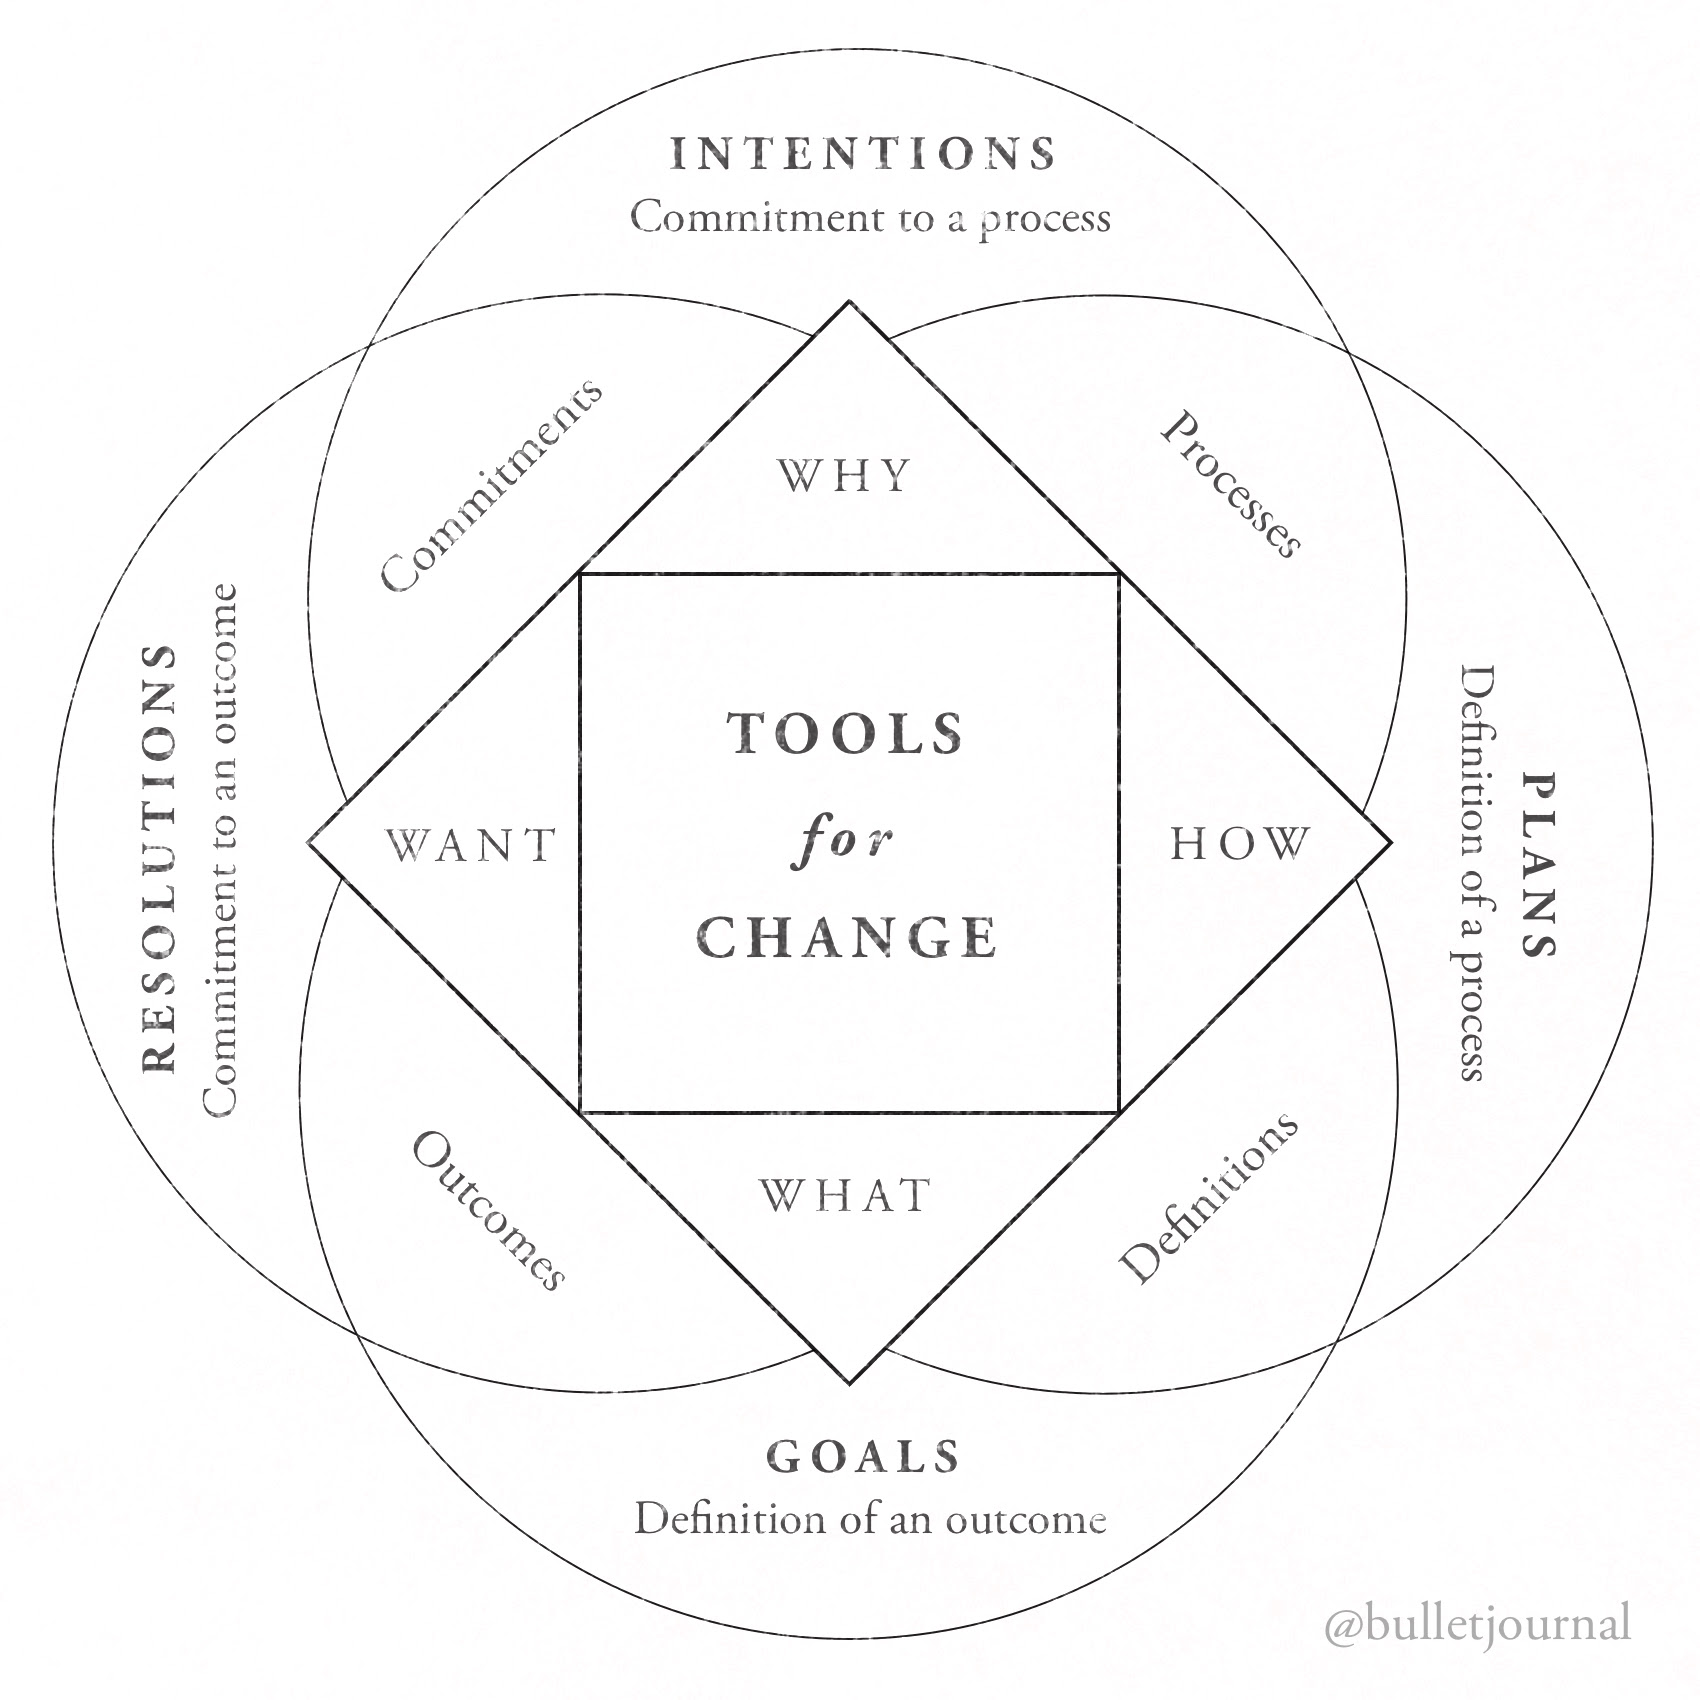 Bullet Journal Tools for Change